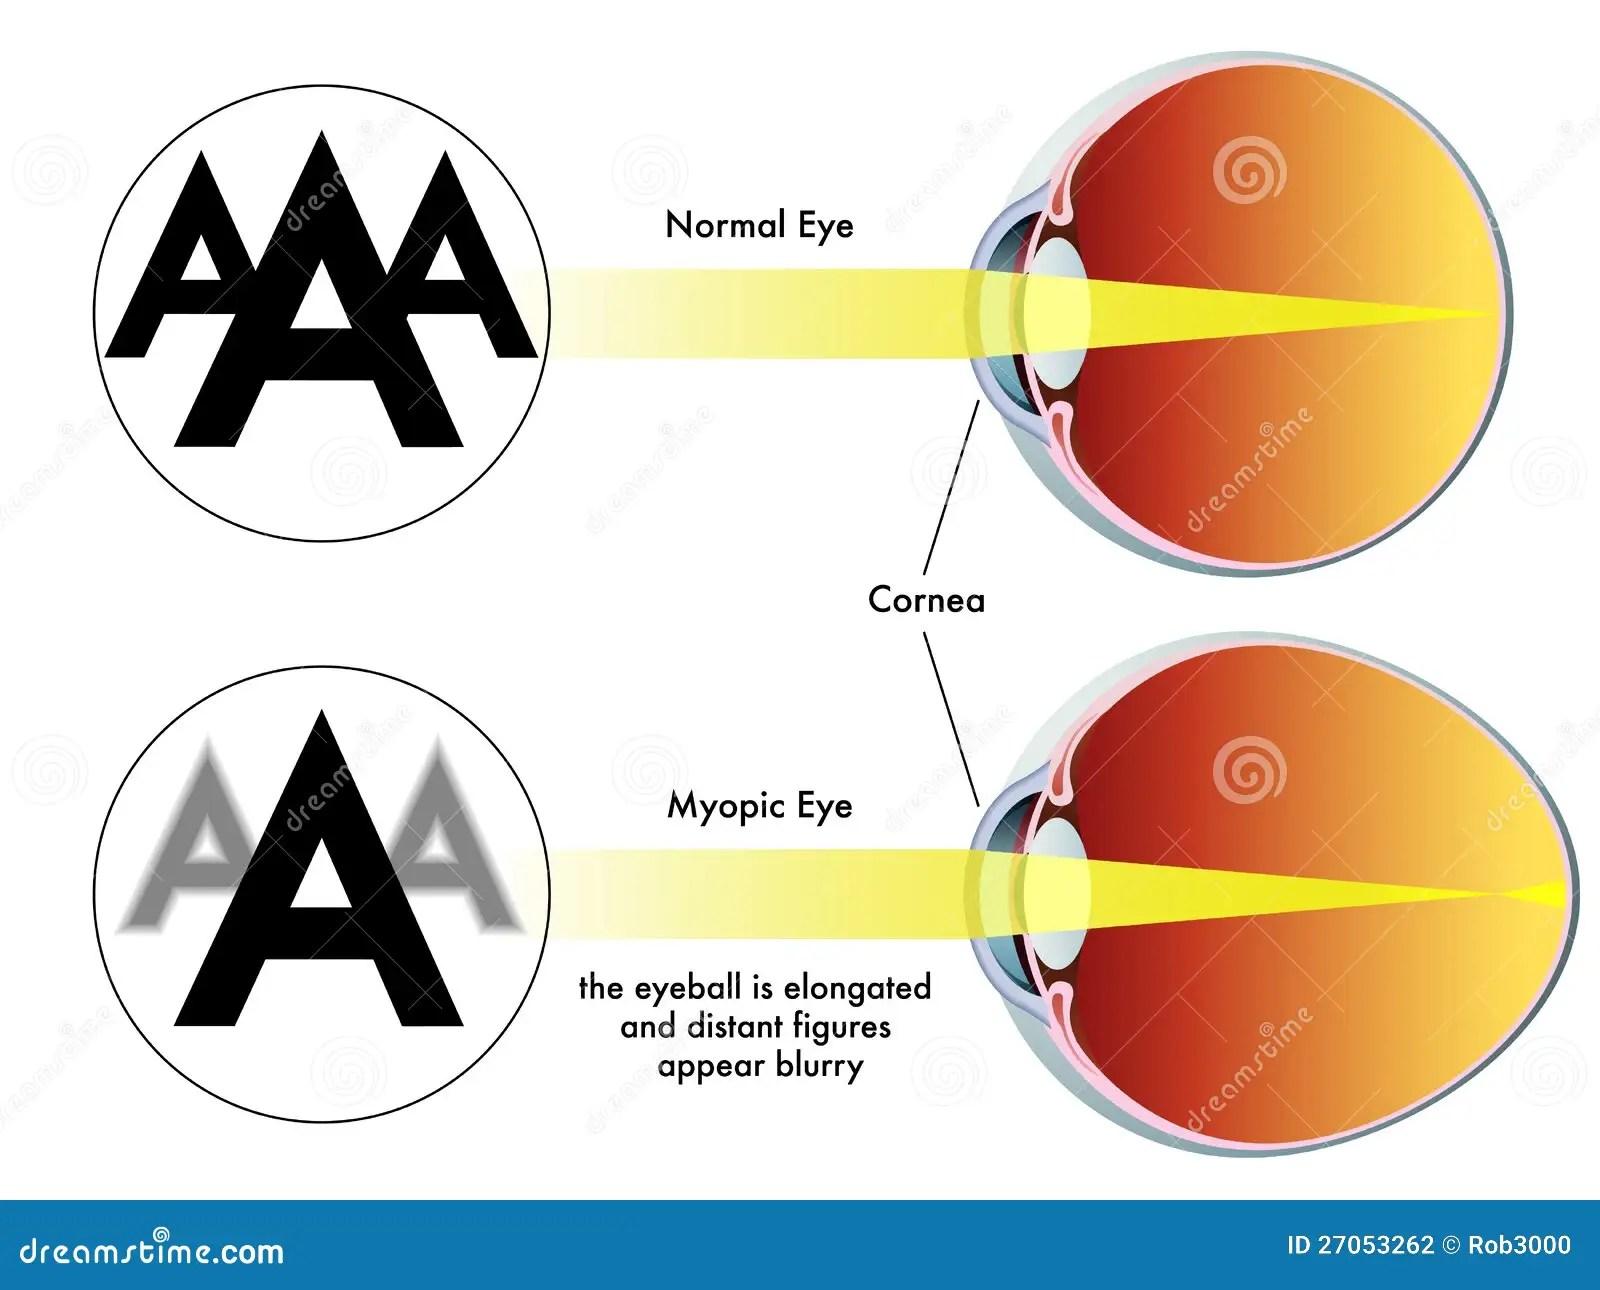 long and short sighted diagram 1999 subaru impreza headlight wiring myopia stock photography image 27053262